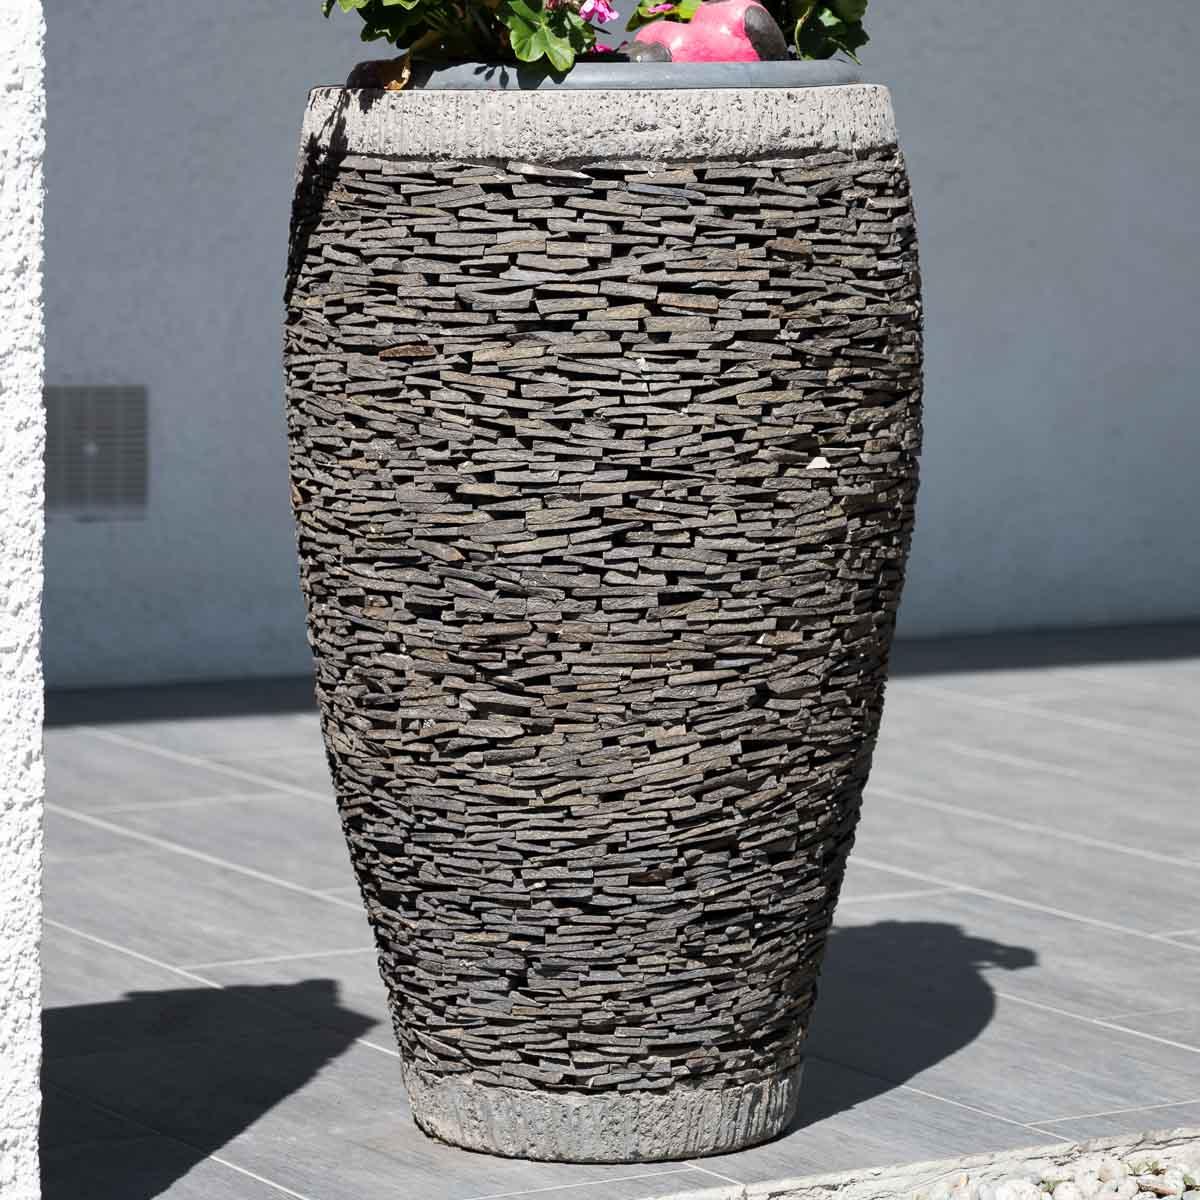 Maceta tiesto jardinera ovalada pizarra 80 cm jard n for Jardines en piedra natural